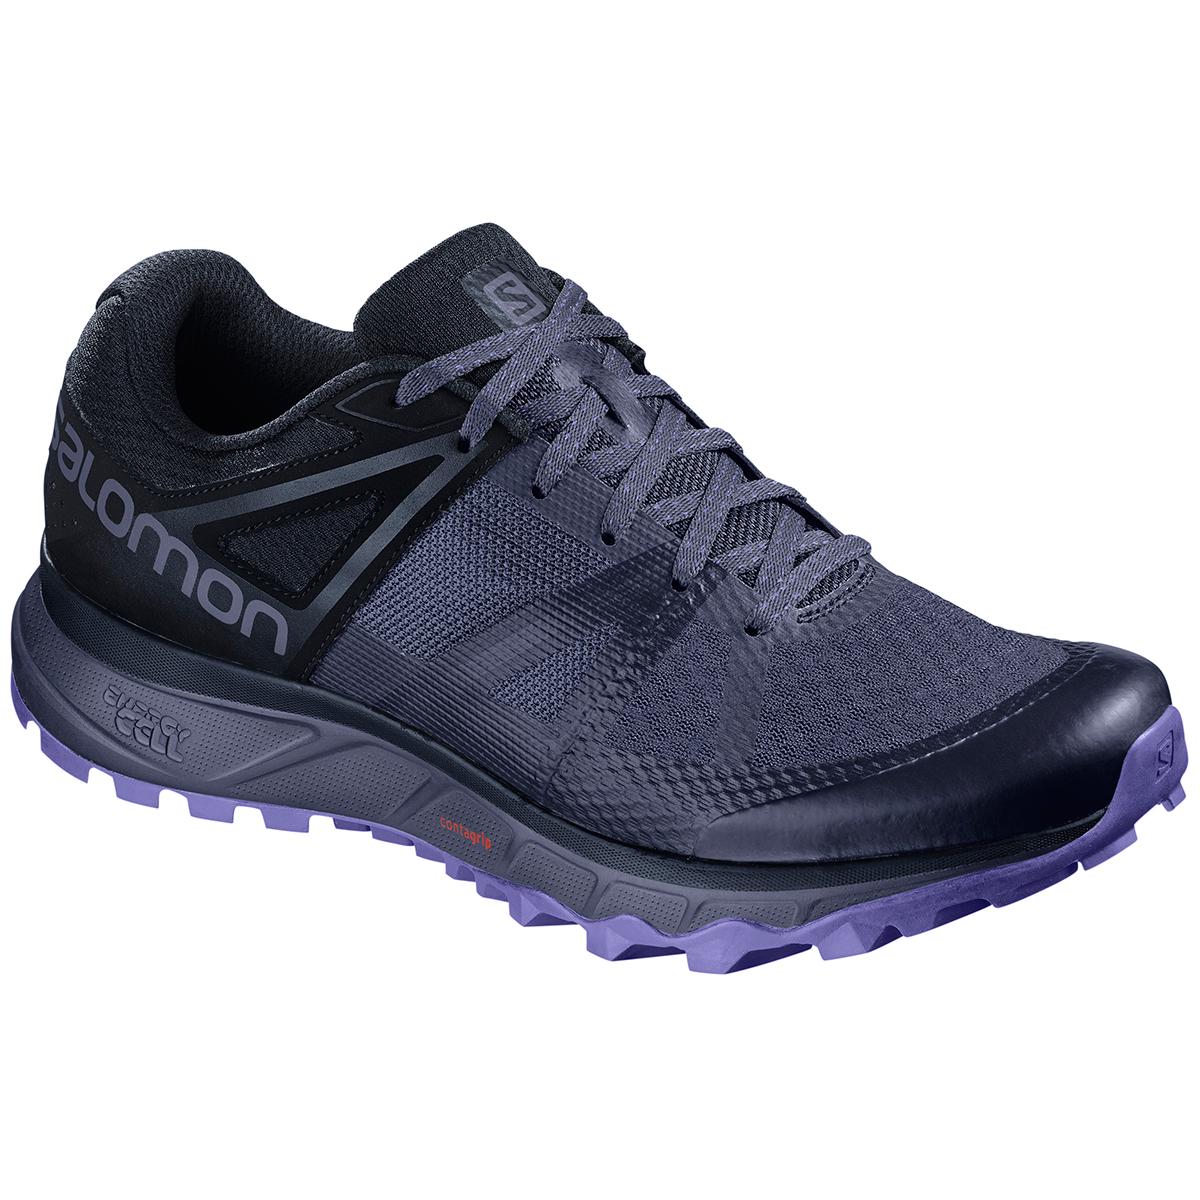 Salomon Women's Trailster Trail Running Shoes - Blue, 9